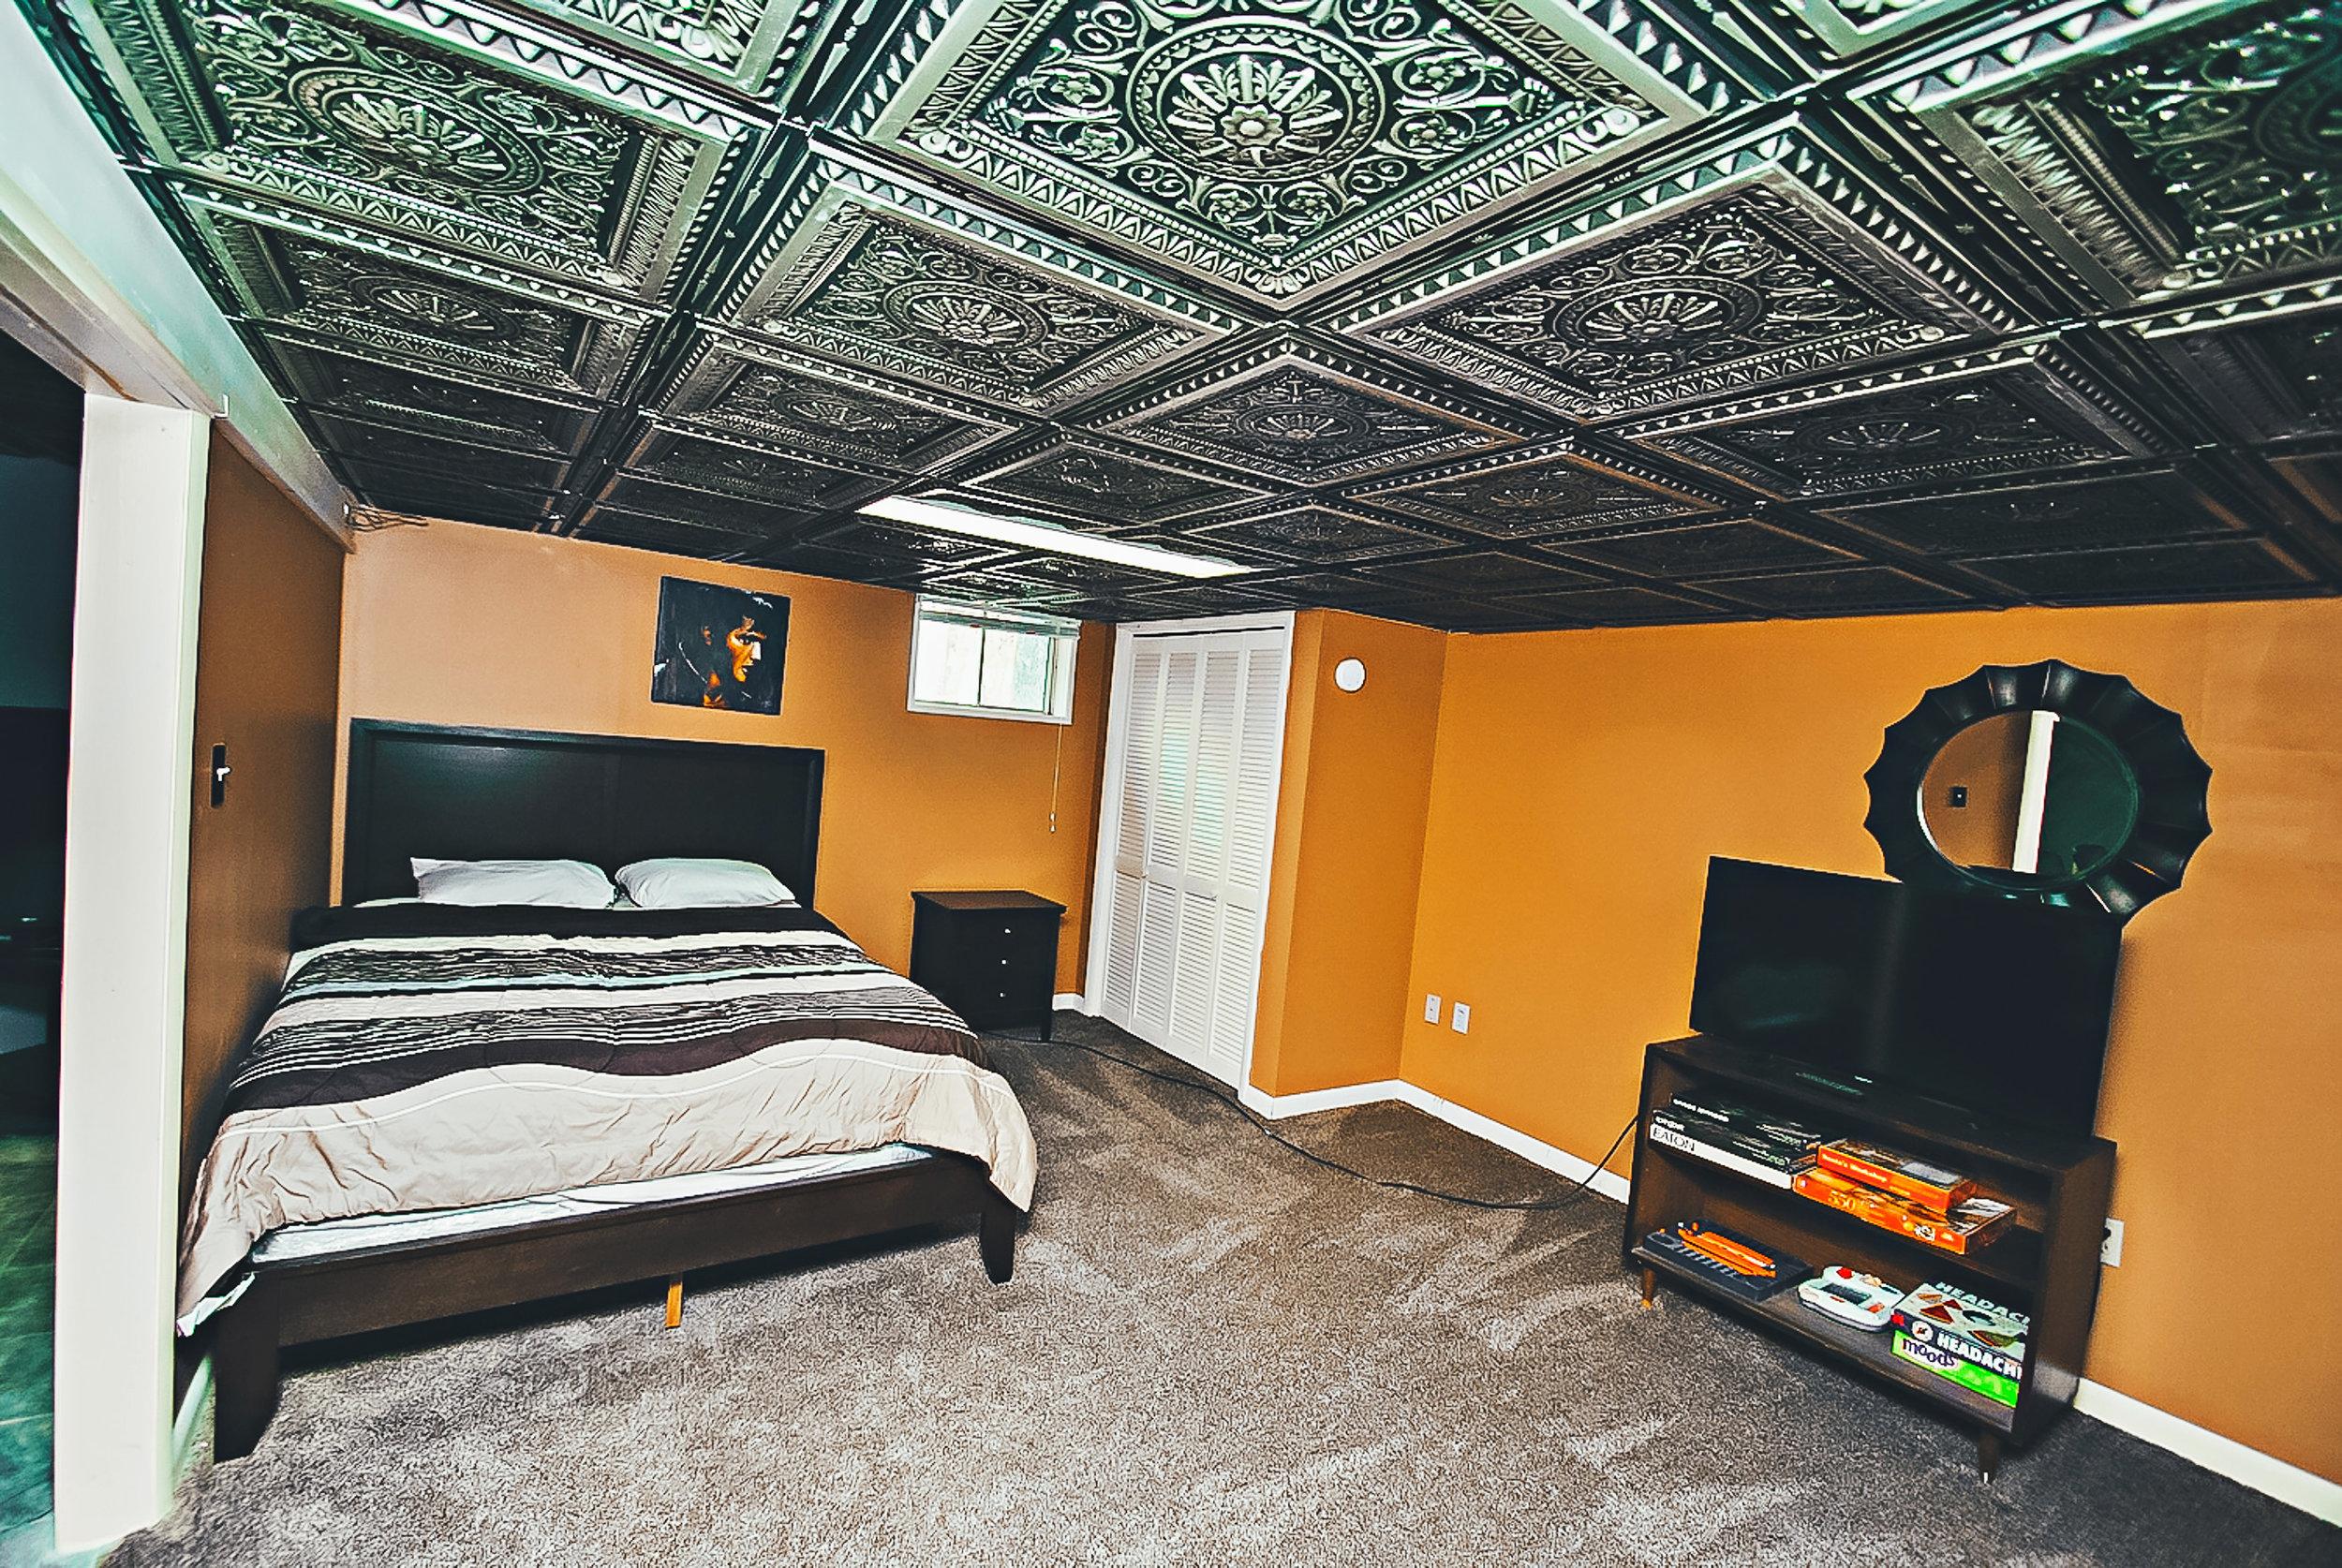 Bedroom+(4).jpg